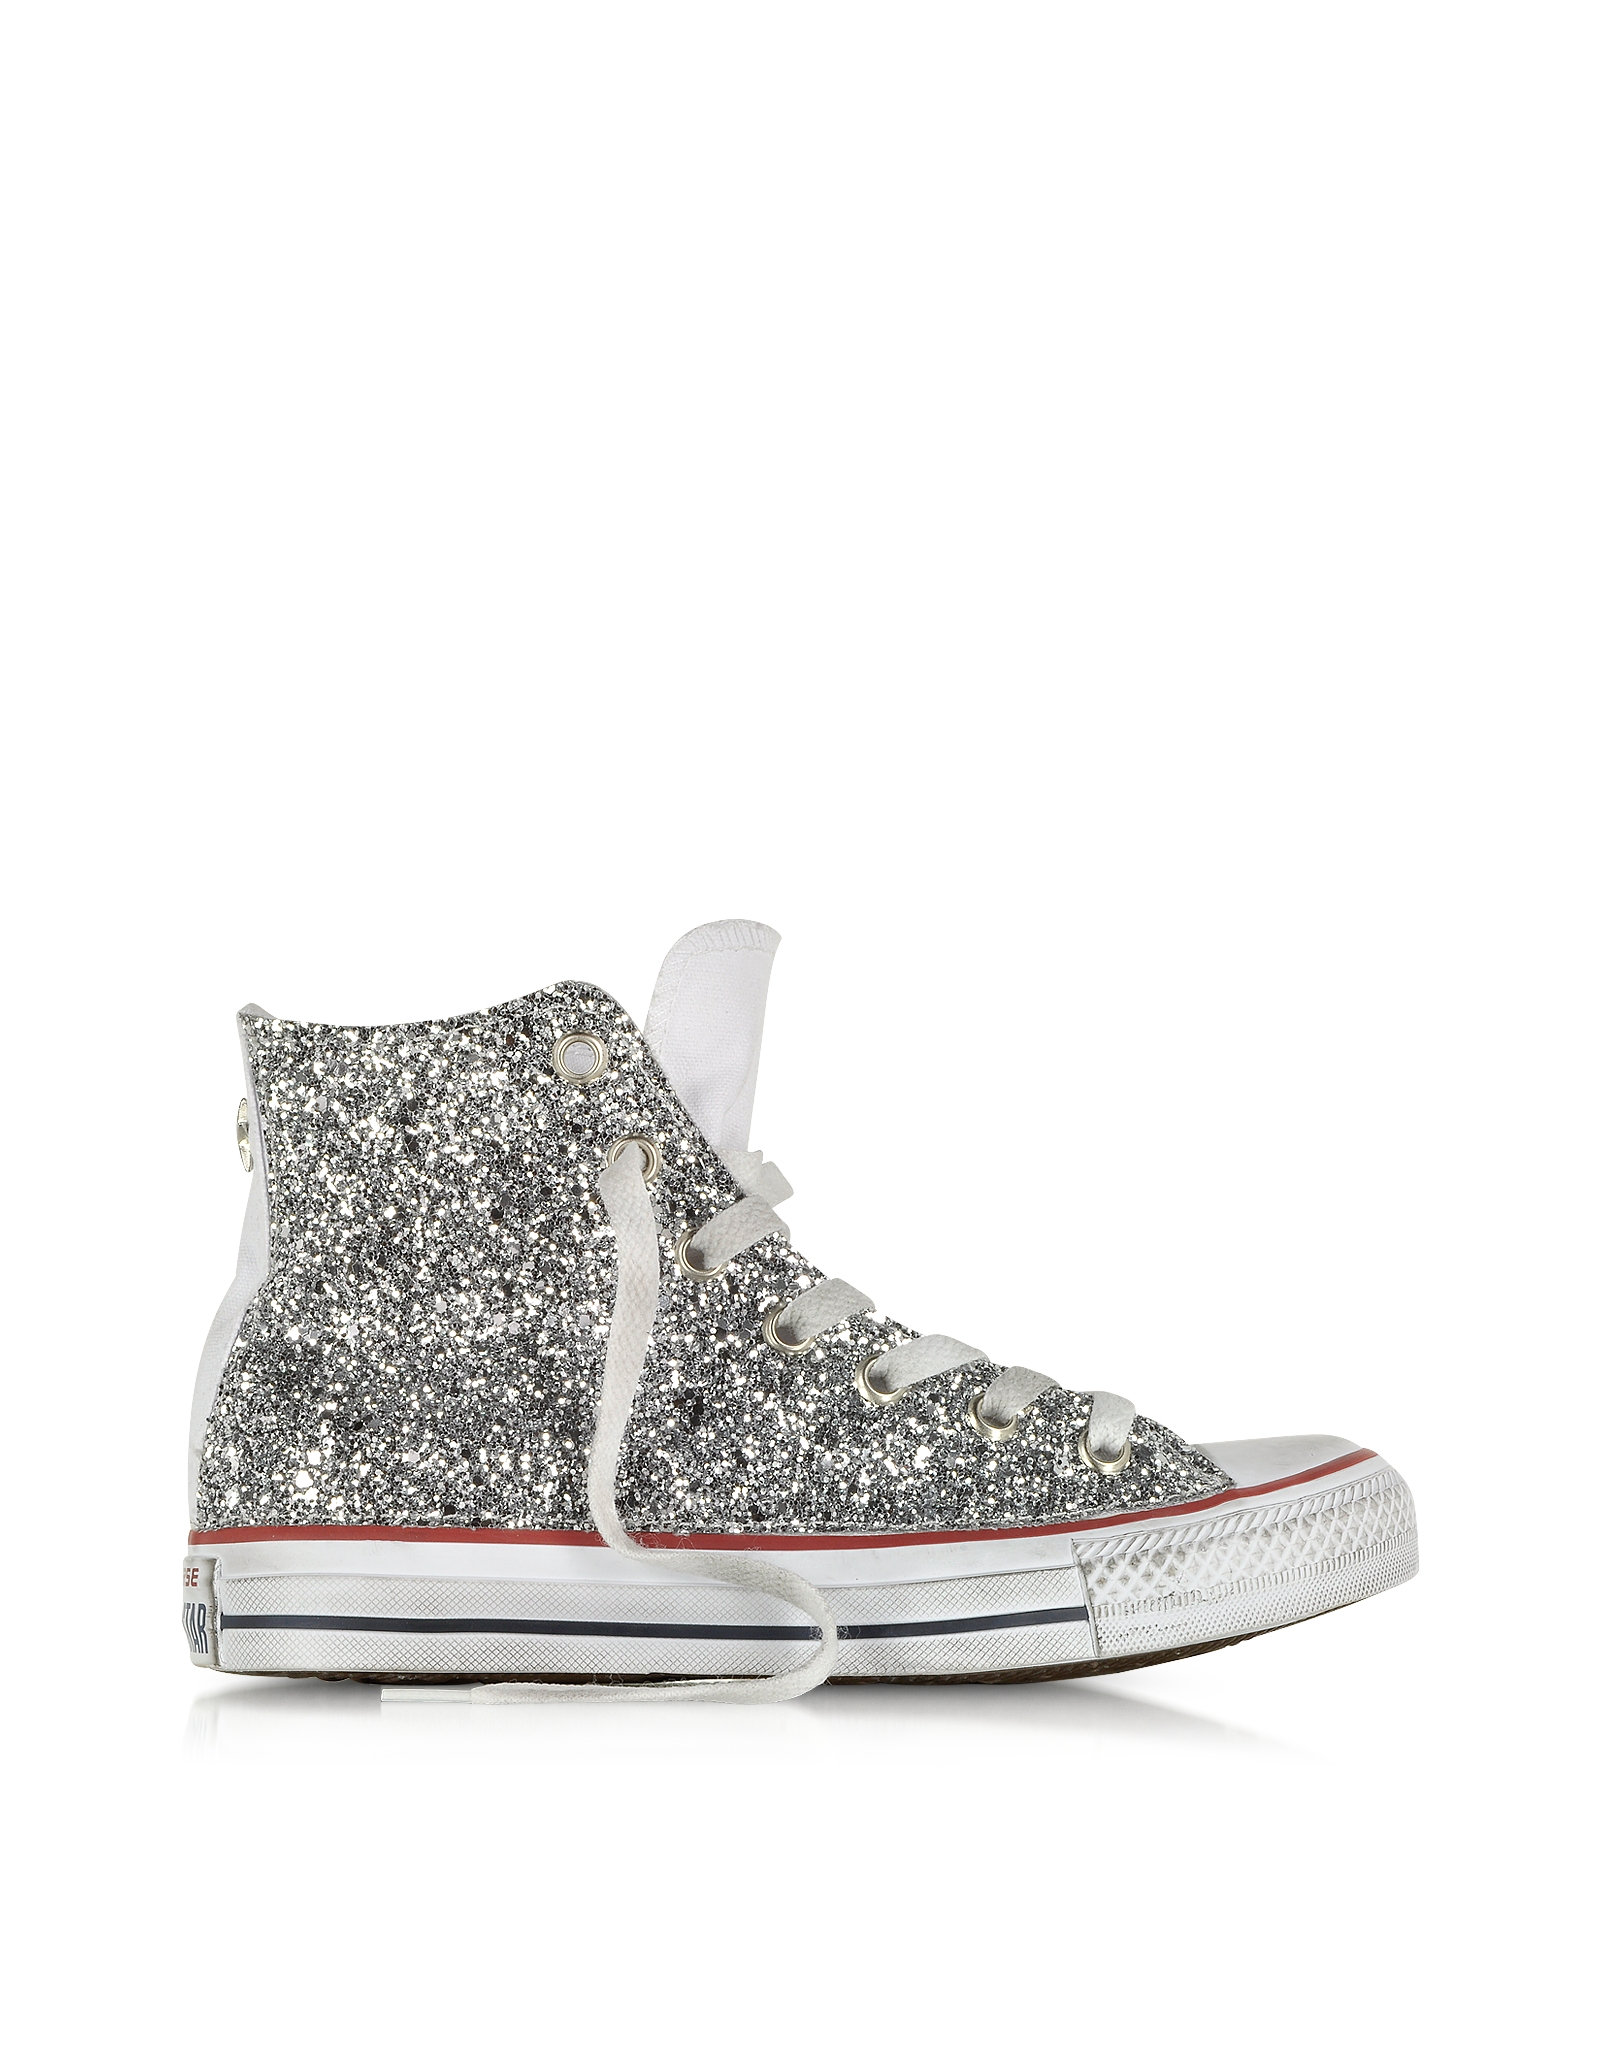 Silver Chiara ferragni shoes